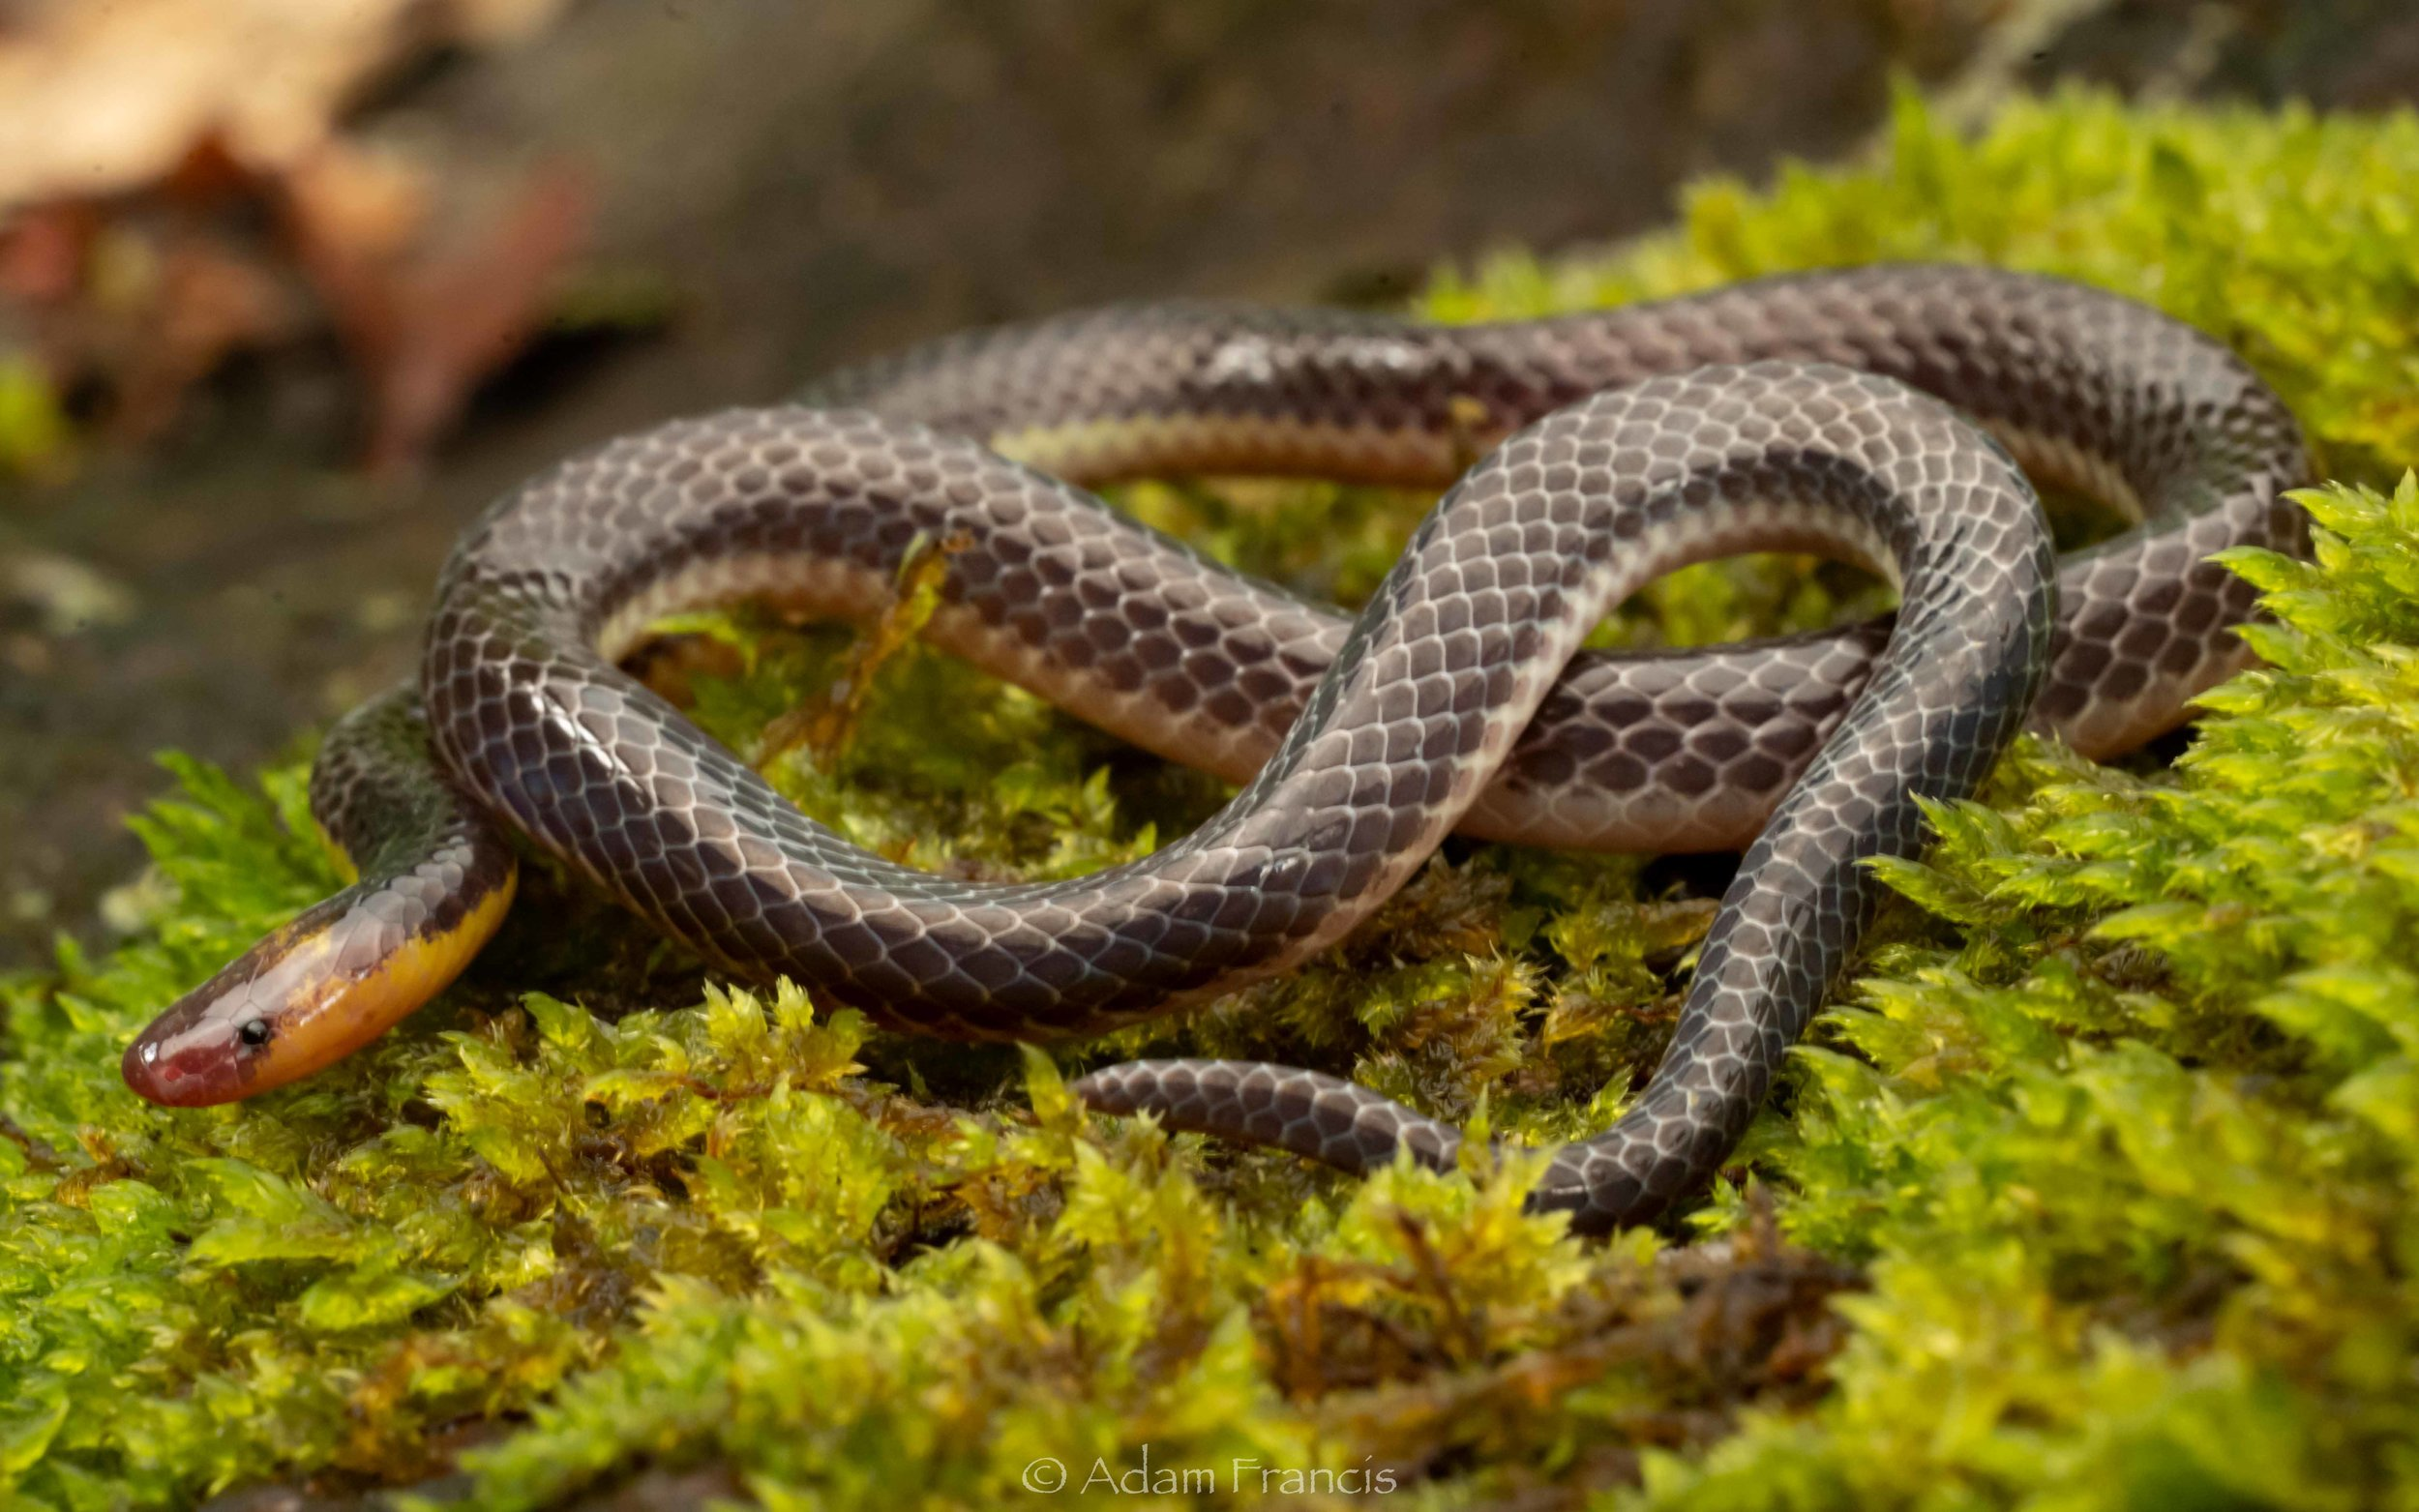 Pink-Headed Reed Snake - Calamaria schlegeli-7.jpg